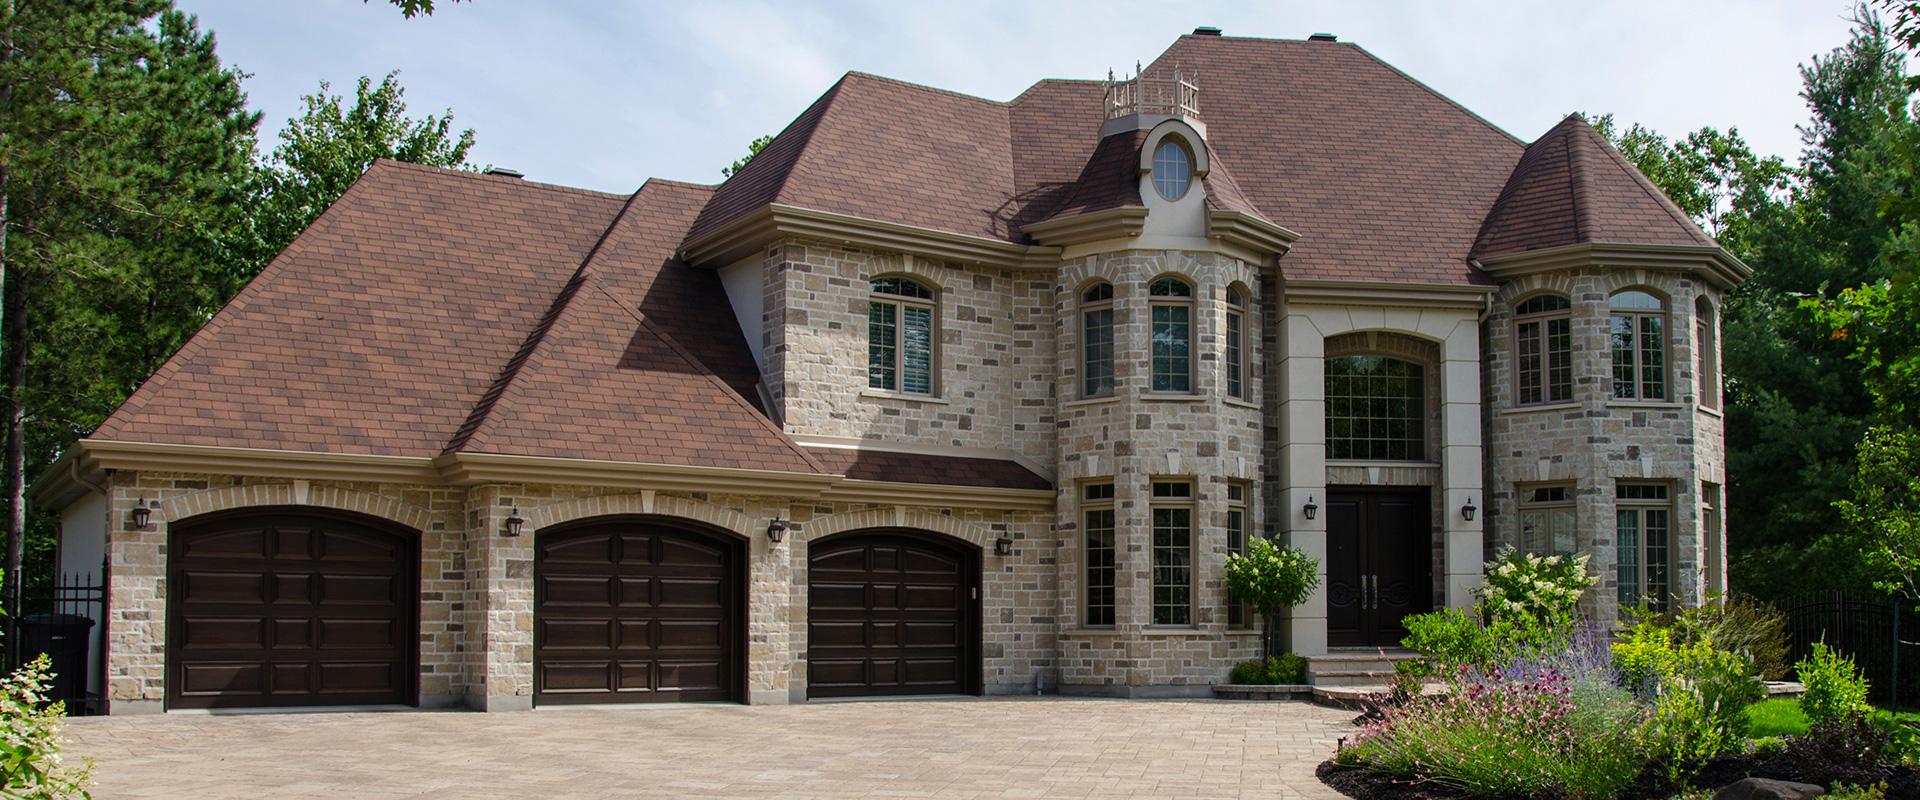 northeast houston real estate